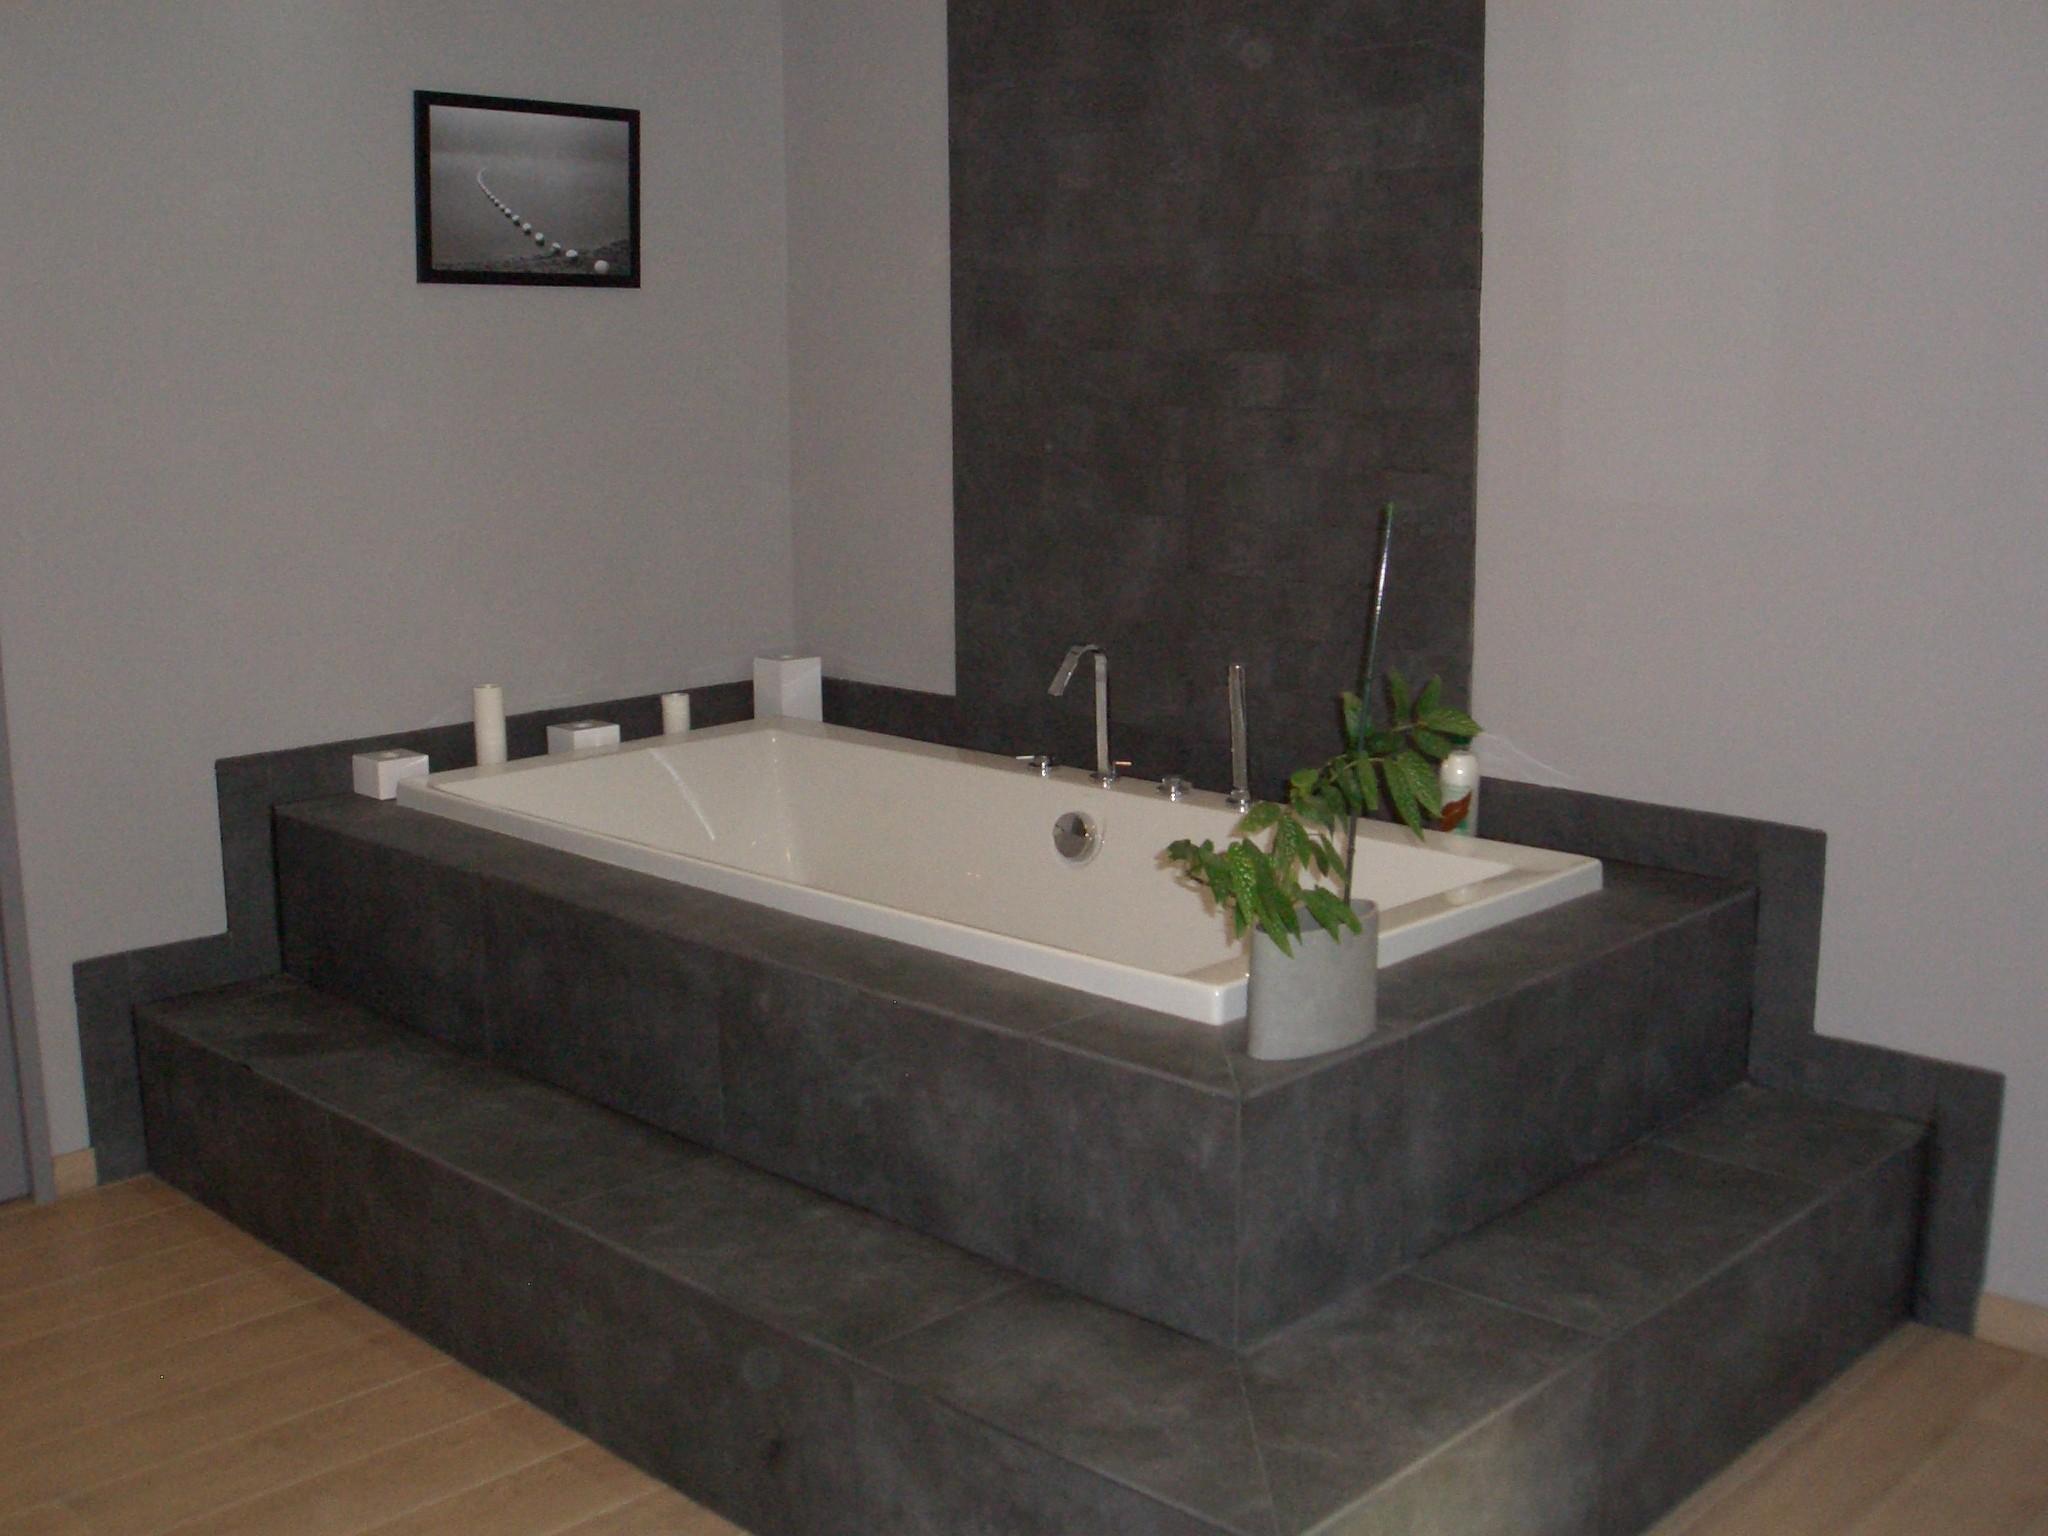 baignoire grande taille. Black Bedroom Furniture Sets. Home Design Ideas